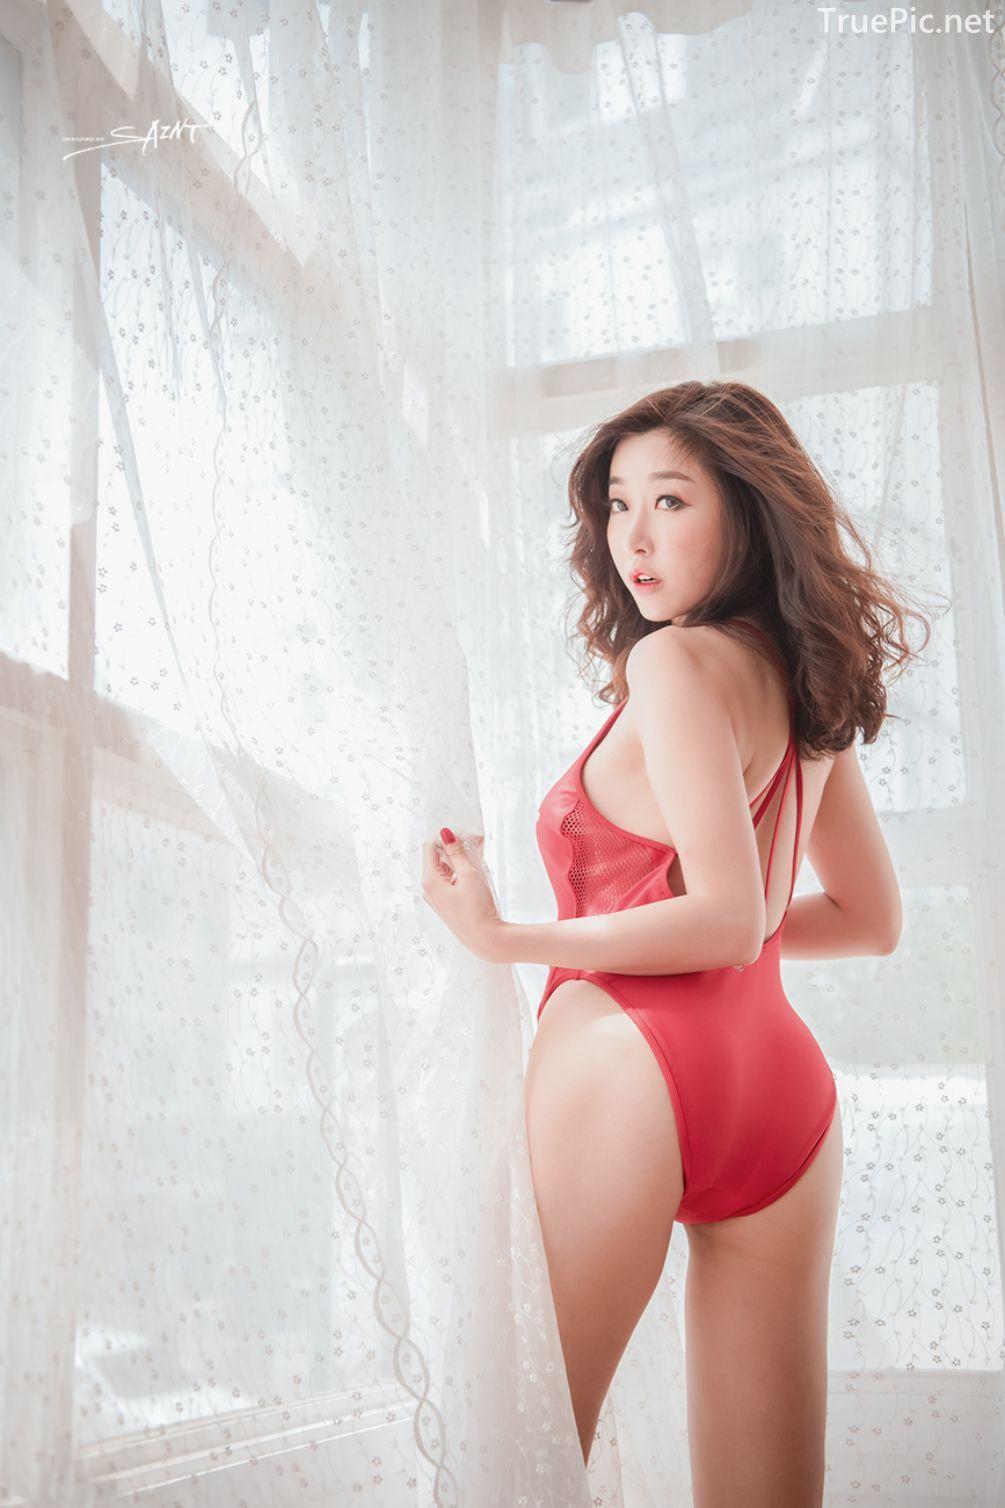 Korean-model-Oh-Haru-Sexy-Indoor-Photoshoot-Collection-TruePic.net- Picture-5